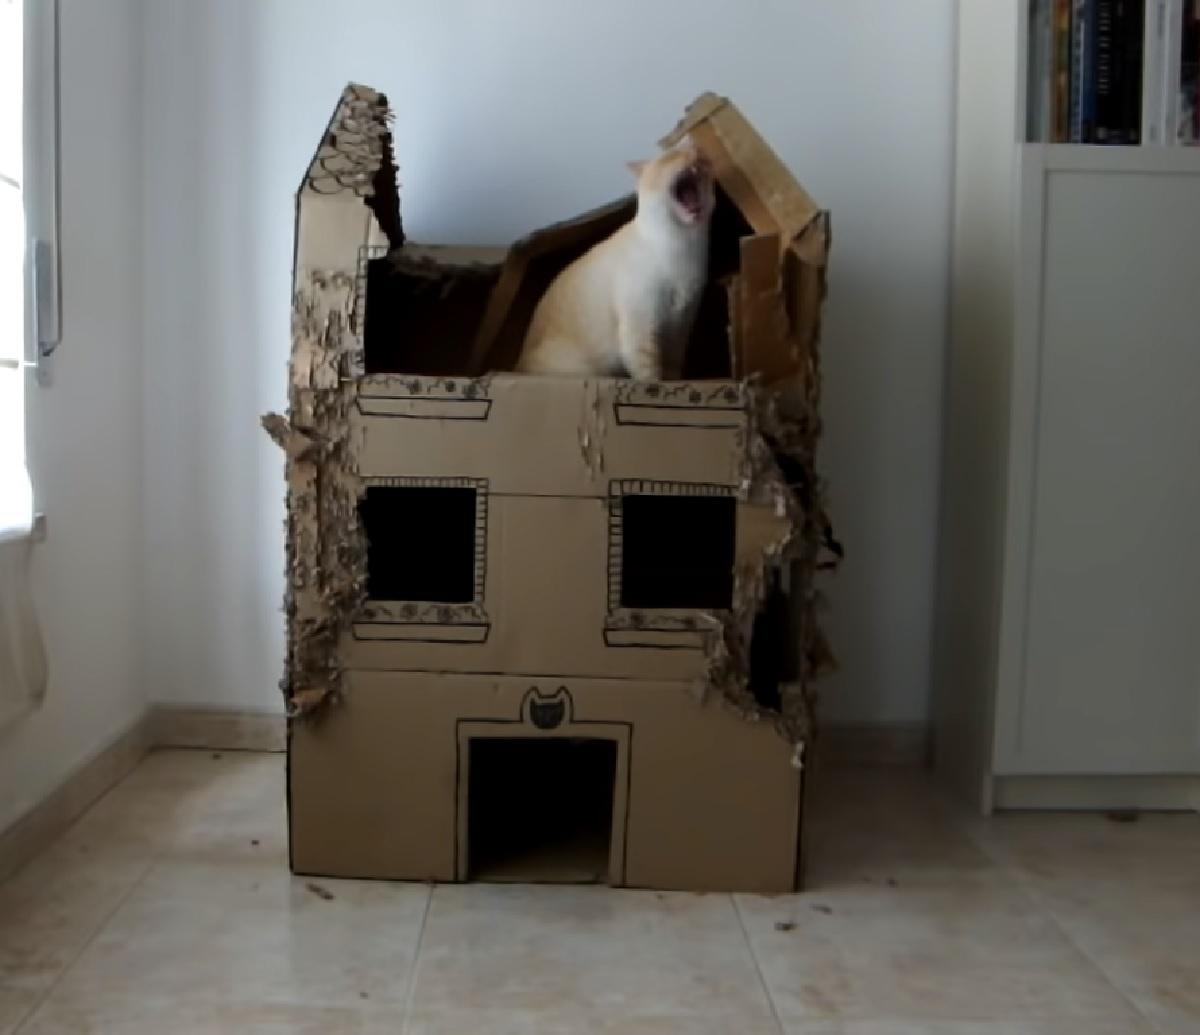 gattini casa rovinata esperimento